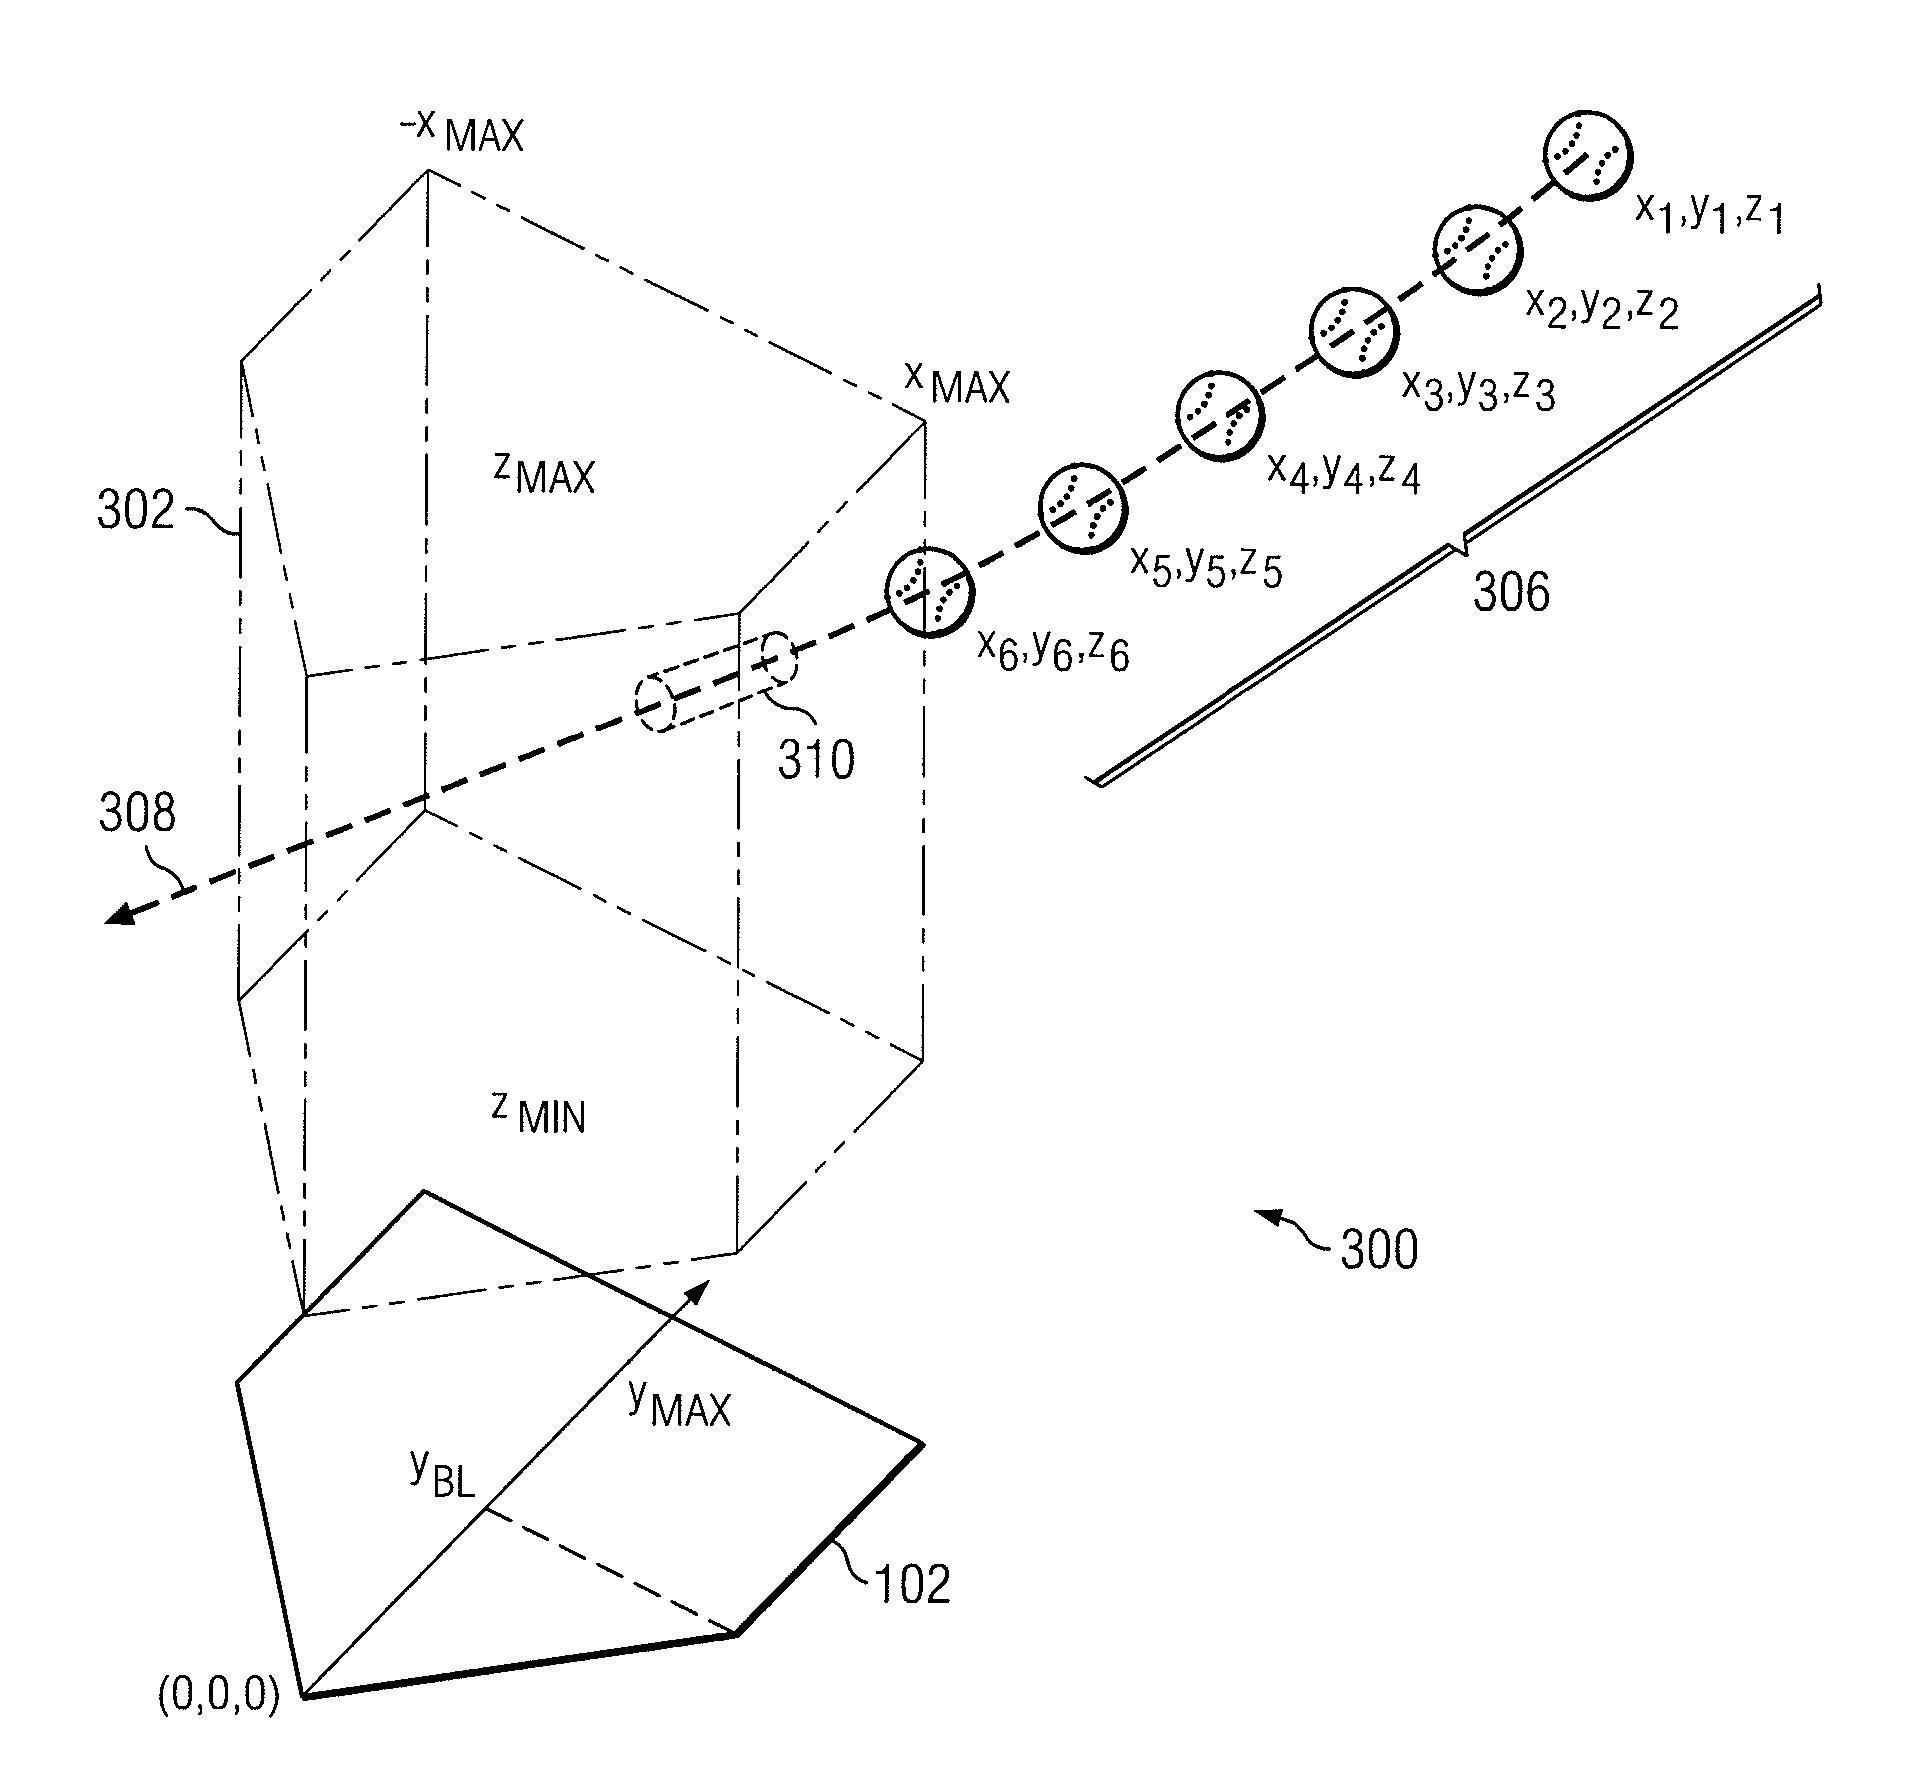 Baseball Diagram With Positions Baseball Free Engine